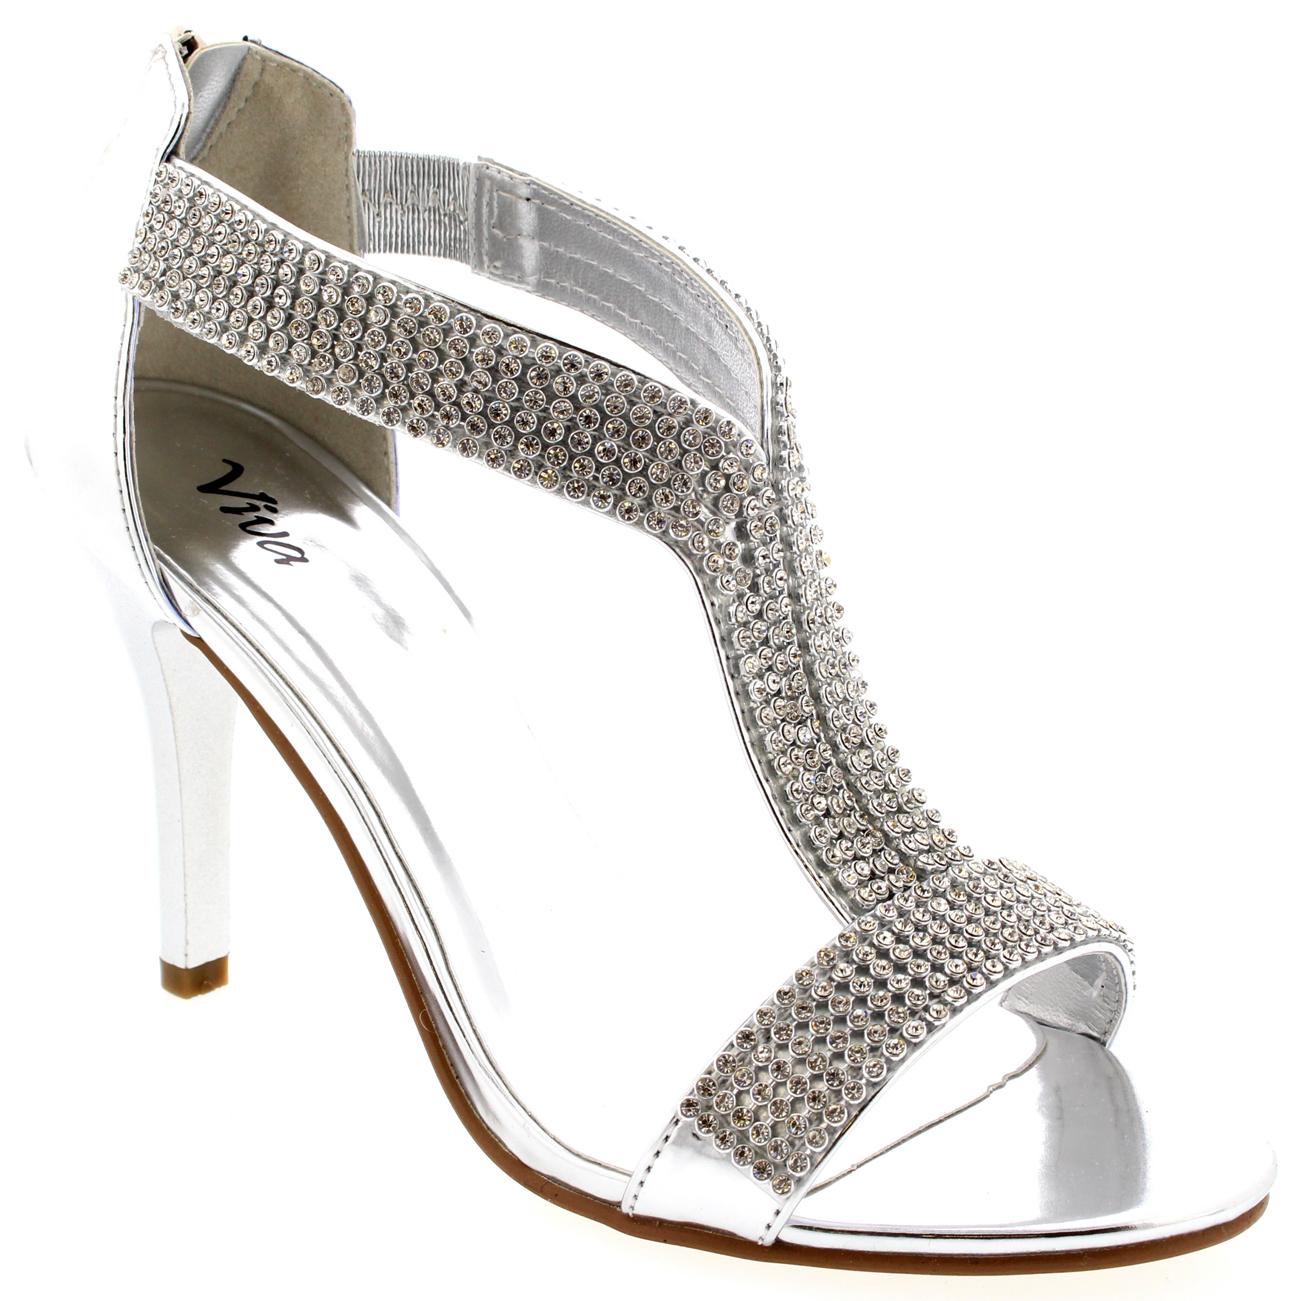 Ladies T-Bar Bridal Diamond Dress Metallic Silver Wedding